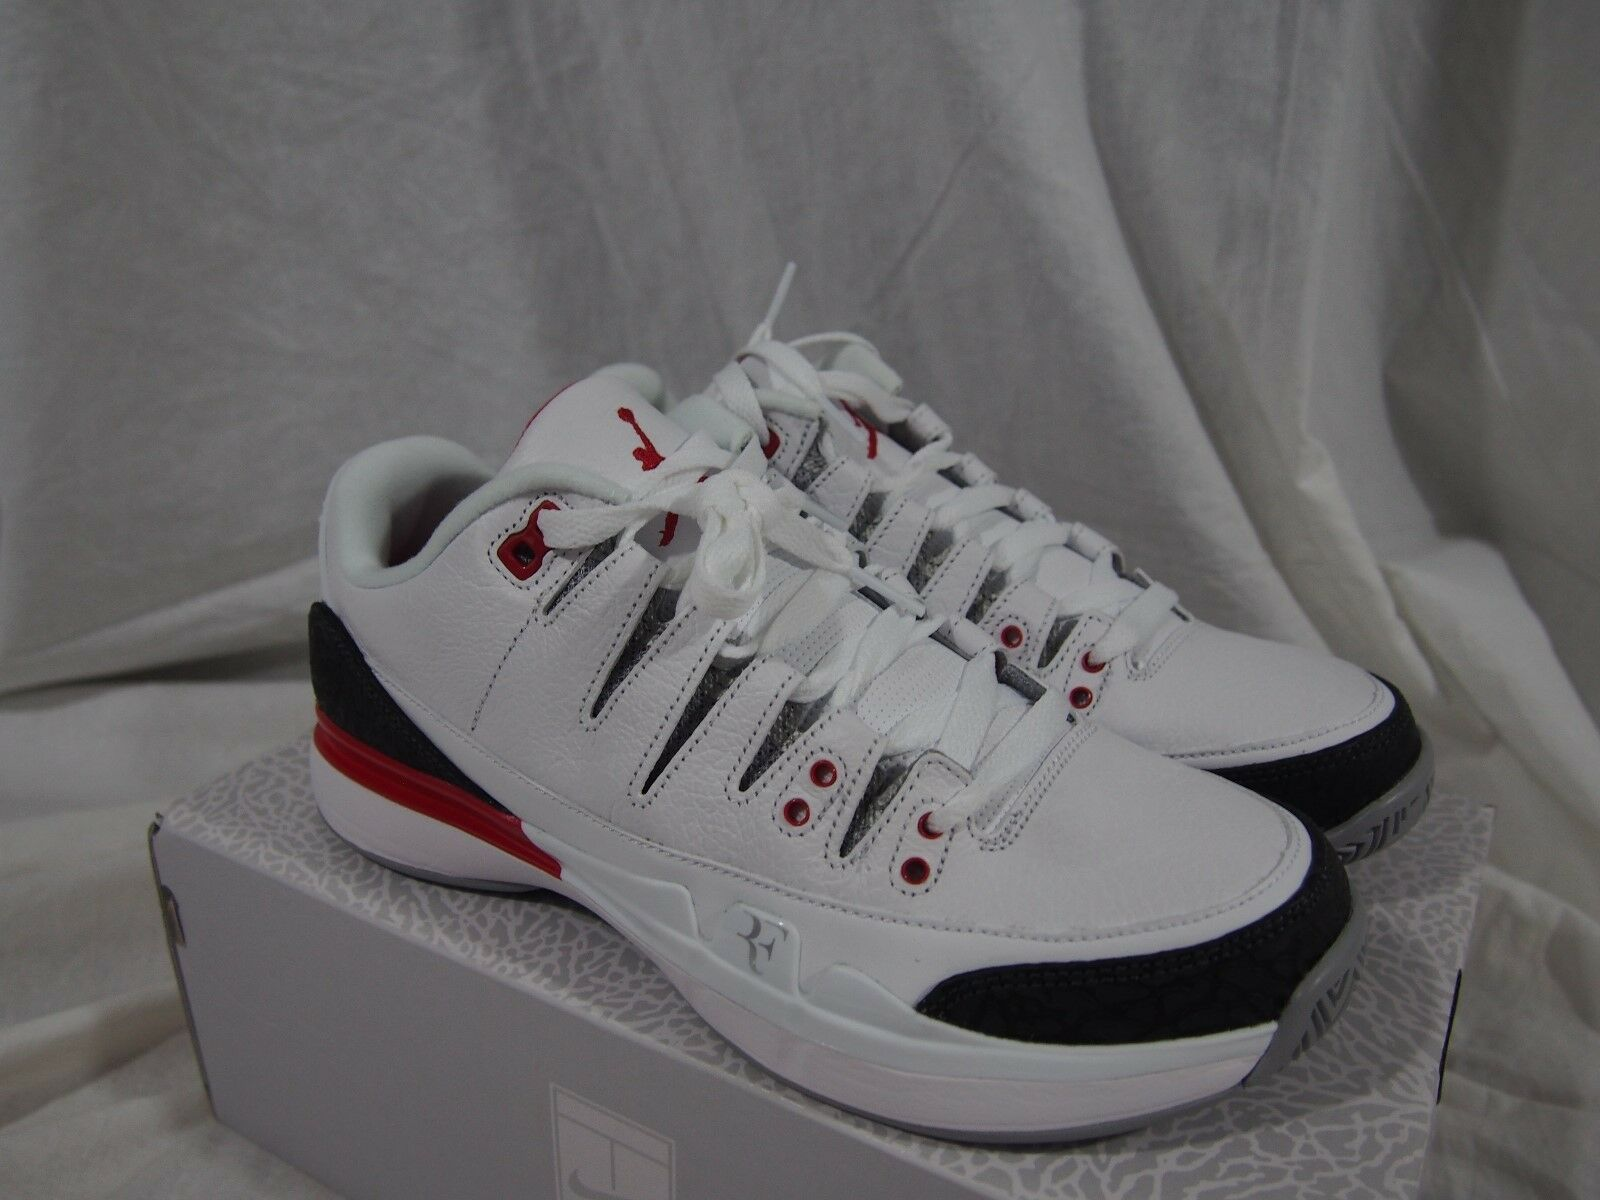 Nike - x aj3 zoom vapore fuoco rosso 709998-106